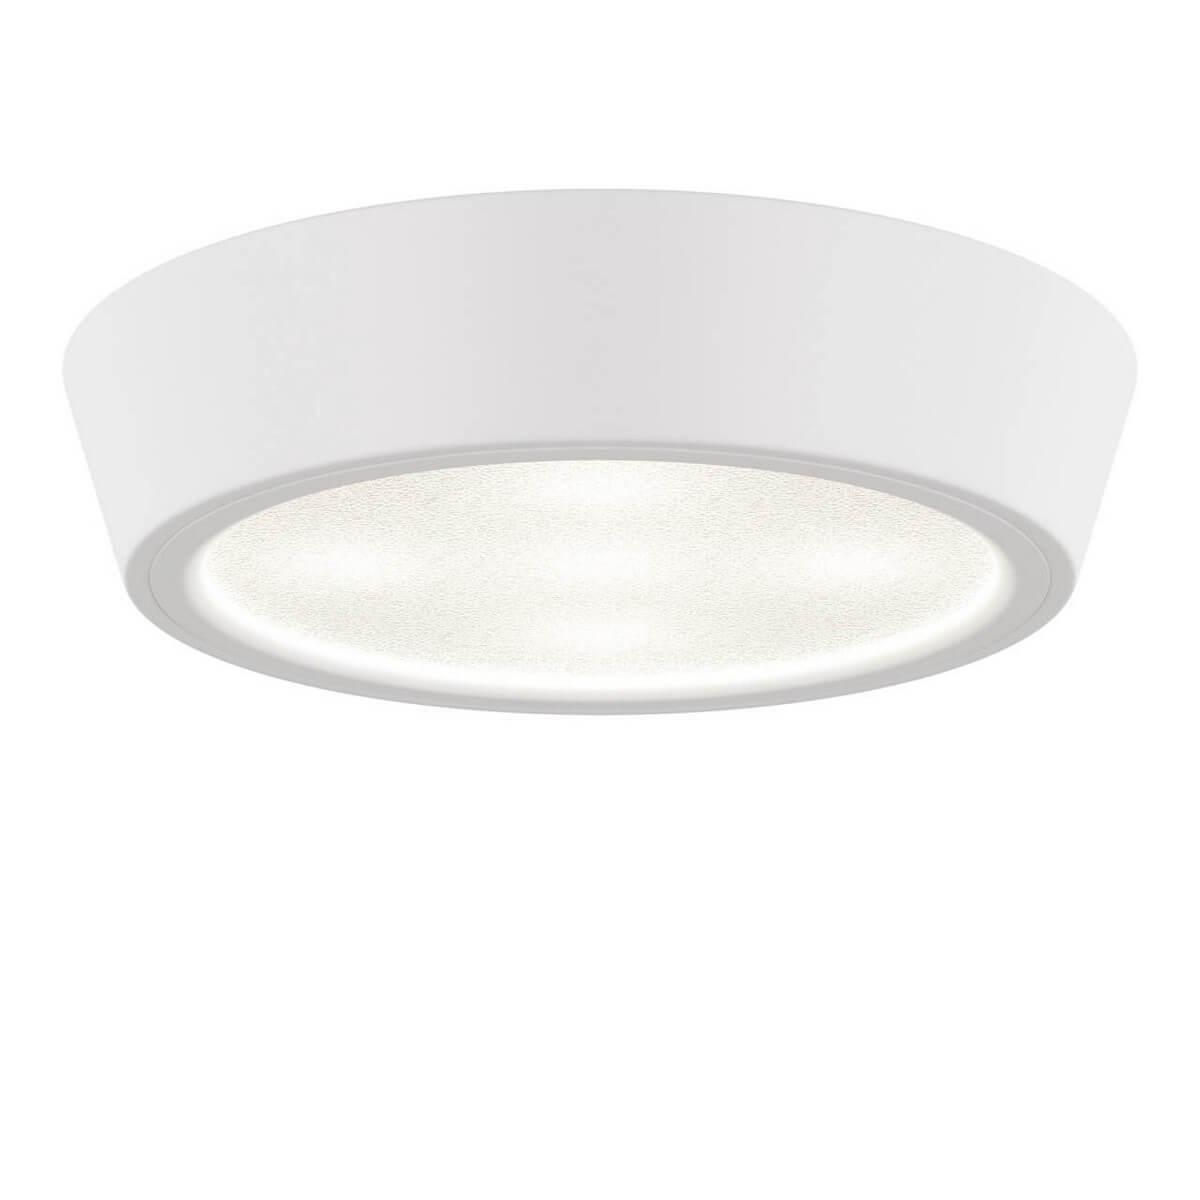 Светильник Lightstar 214702 Urbano Mini LED